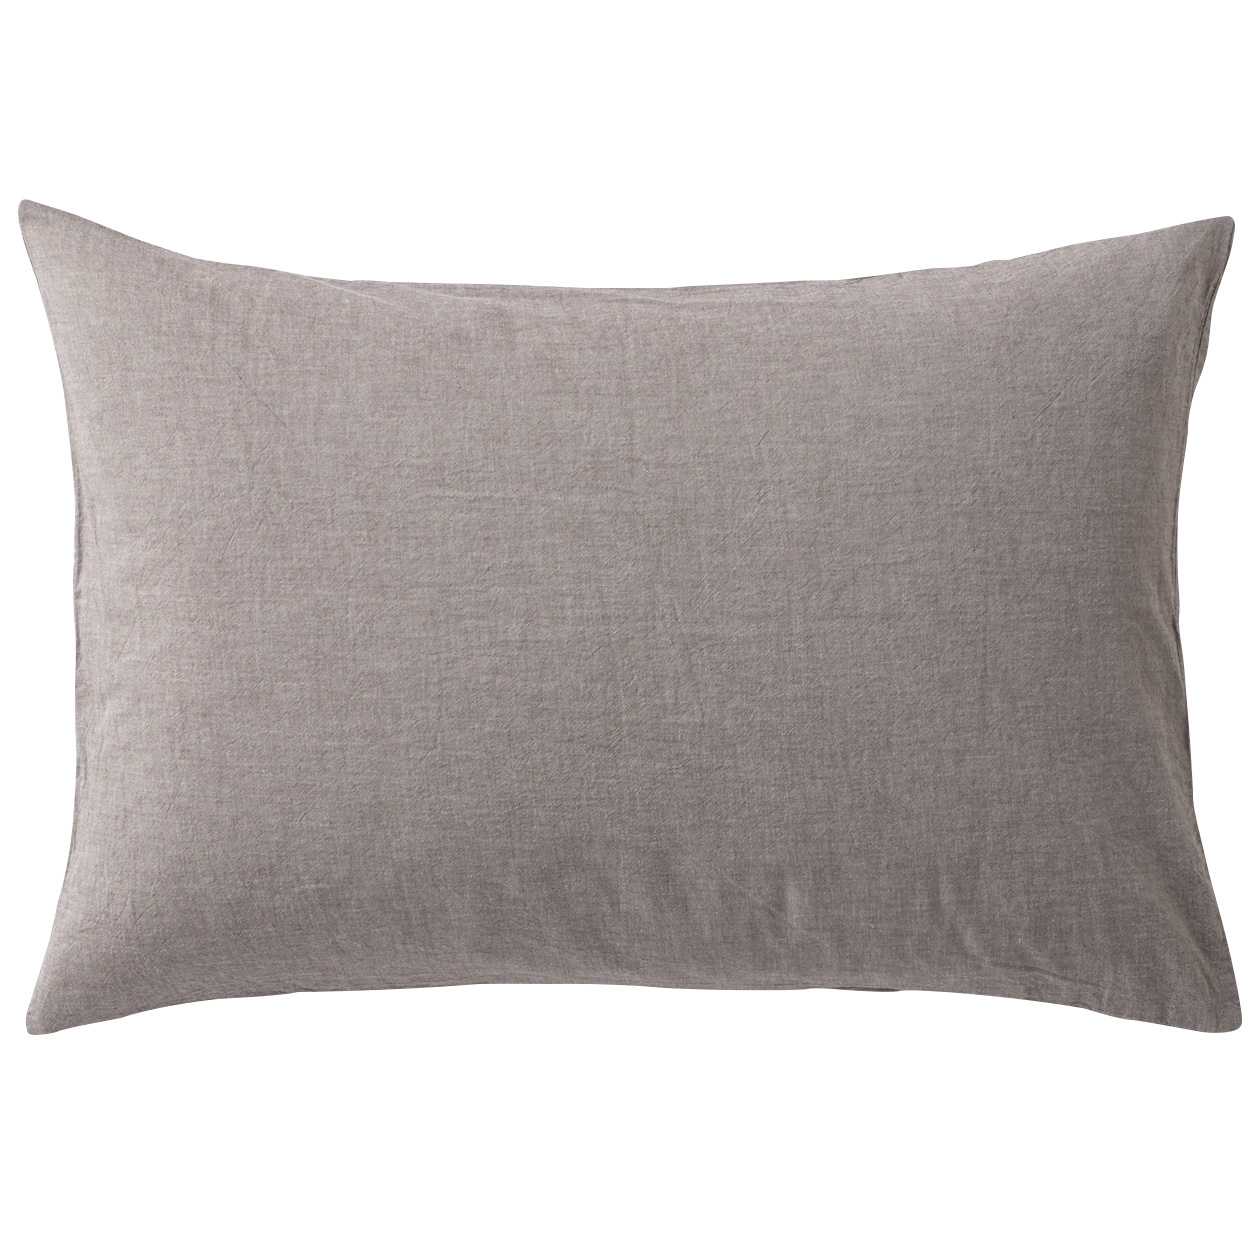 RoomClip商品情報 - オーガニックコットン洗いざらしまくらカバー/生成 43×100cm用/ブラウン